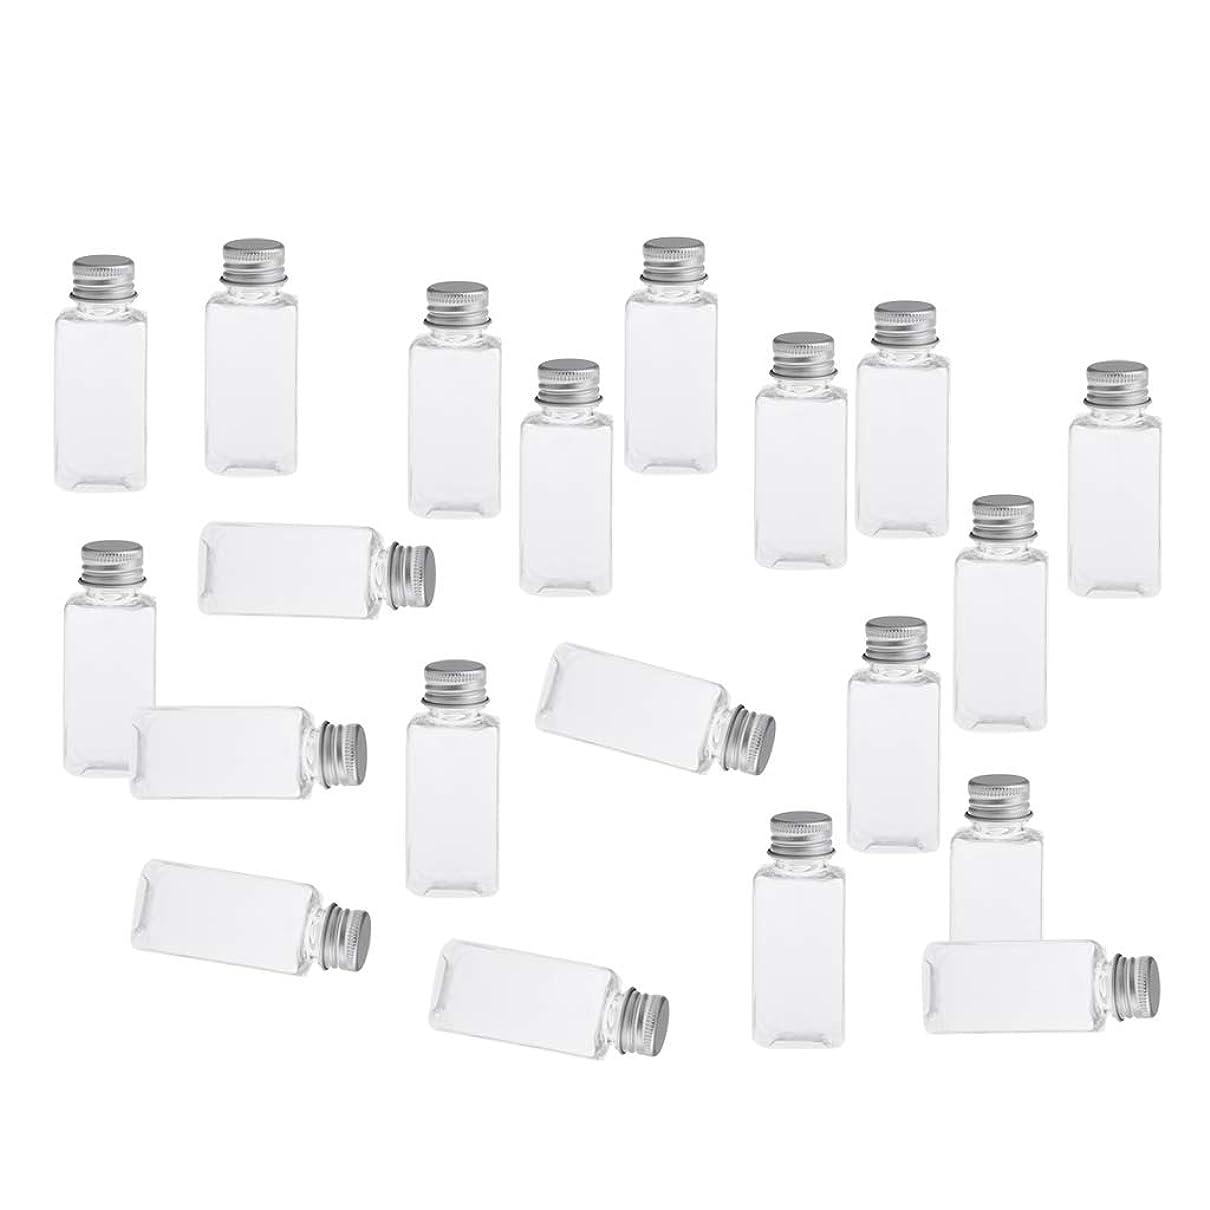 SM SunniMix 全8色 PETボトル 空のボトル 小分け用 化粧品 香水 エッセンシャルオイル 漏れ防止 約20個 - クリアシルバー